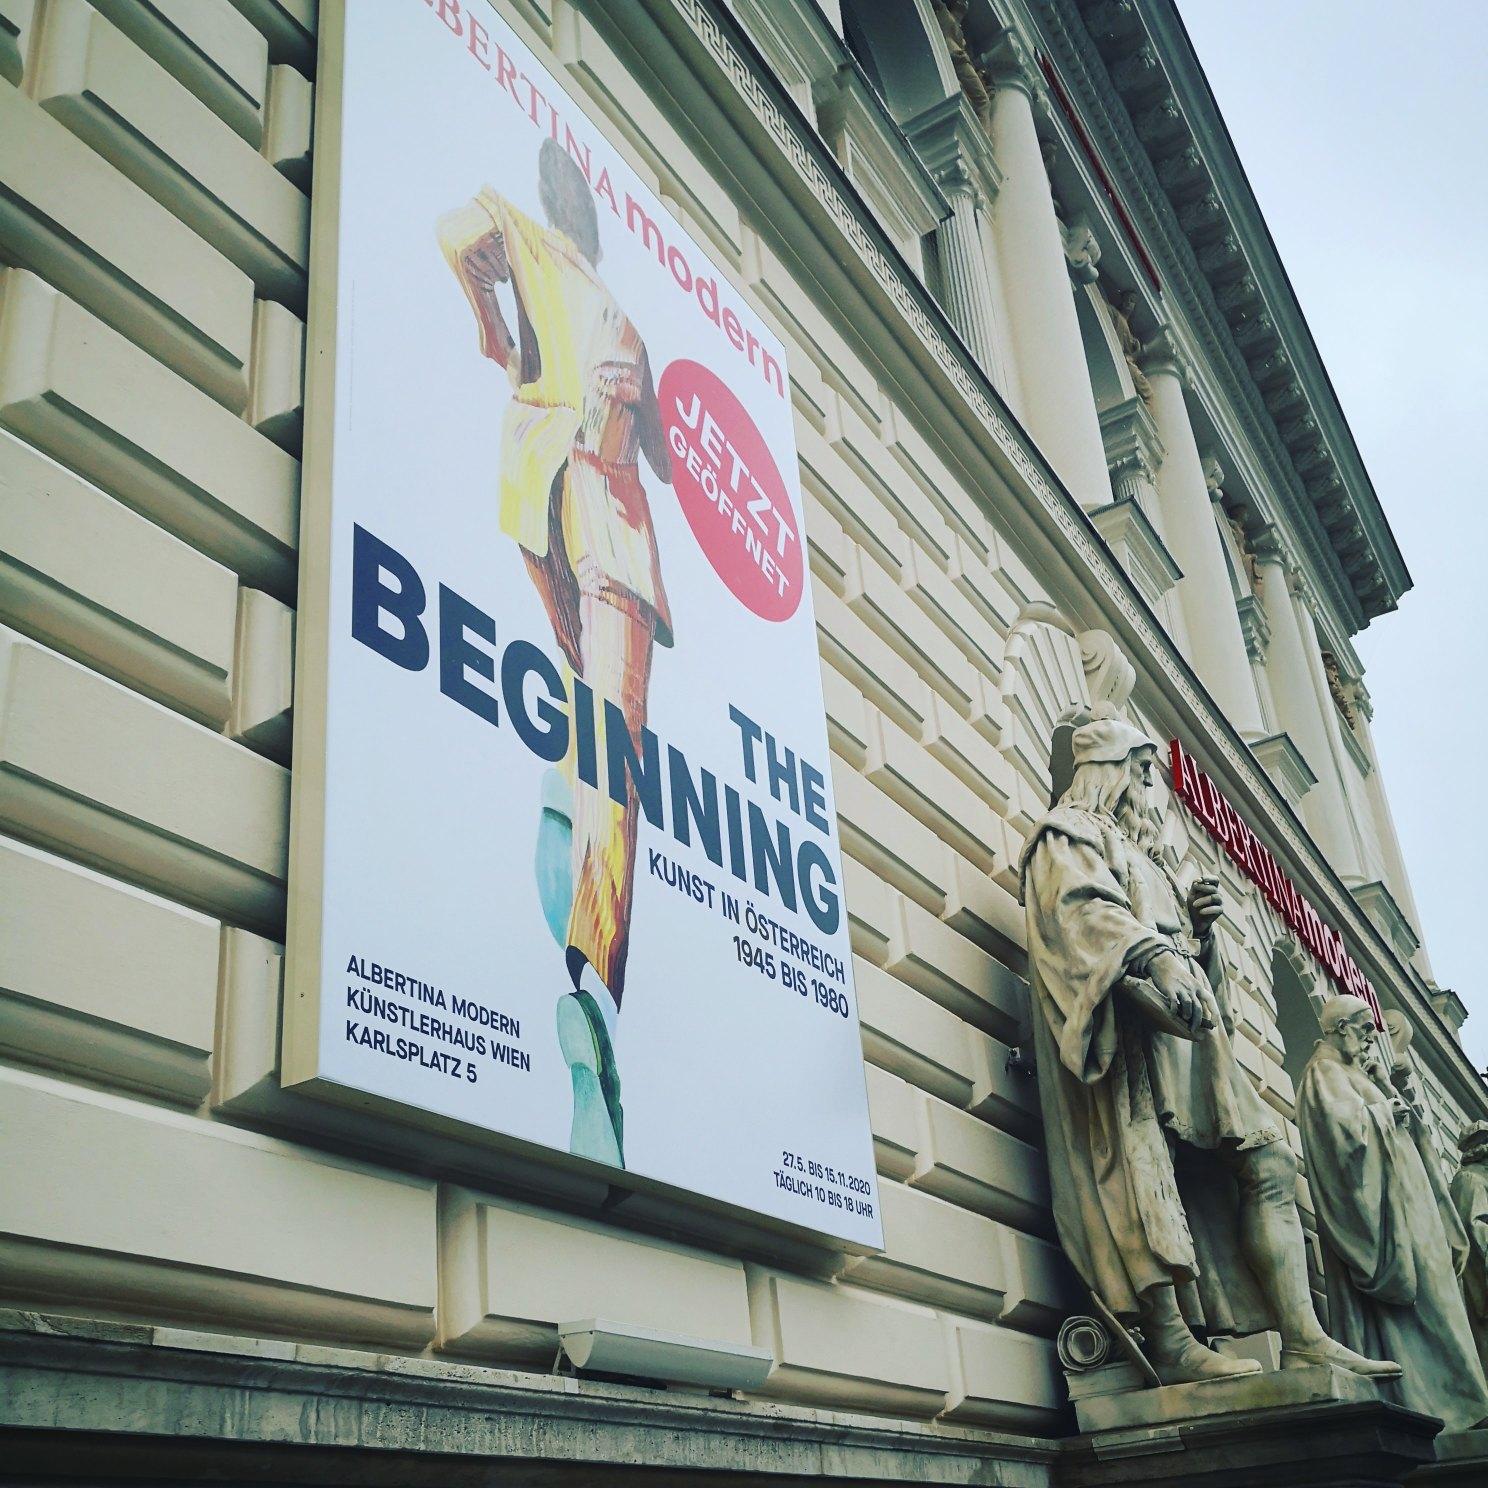 The Beginning, Albertina Modern, Bild (C) Andrea Pickl - kekinwien,at